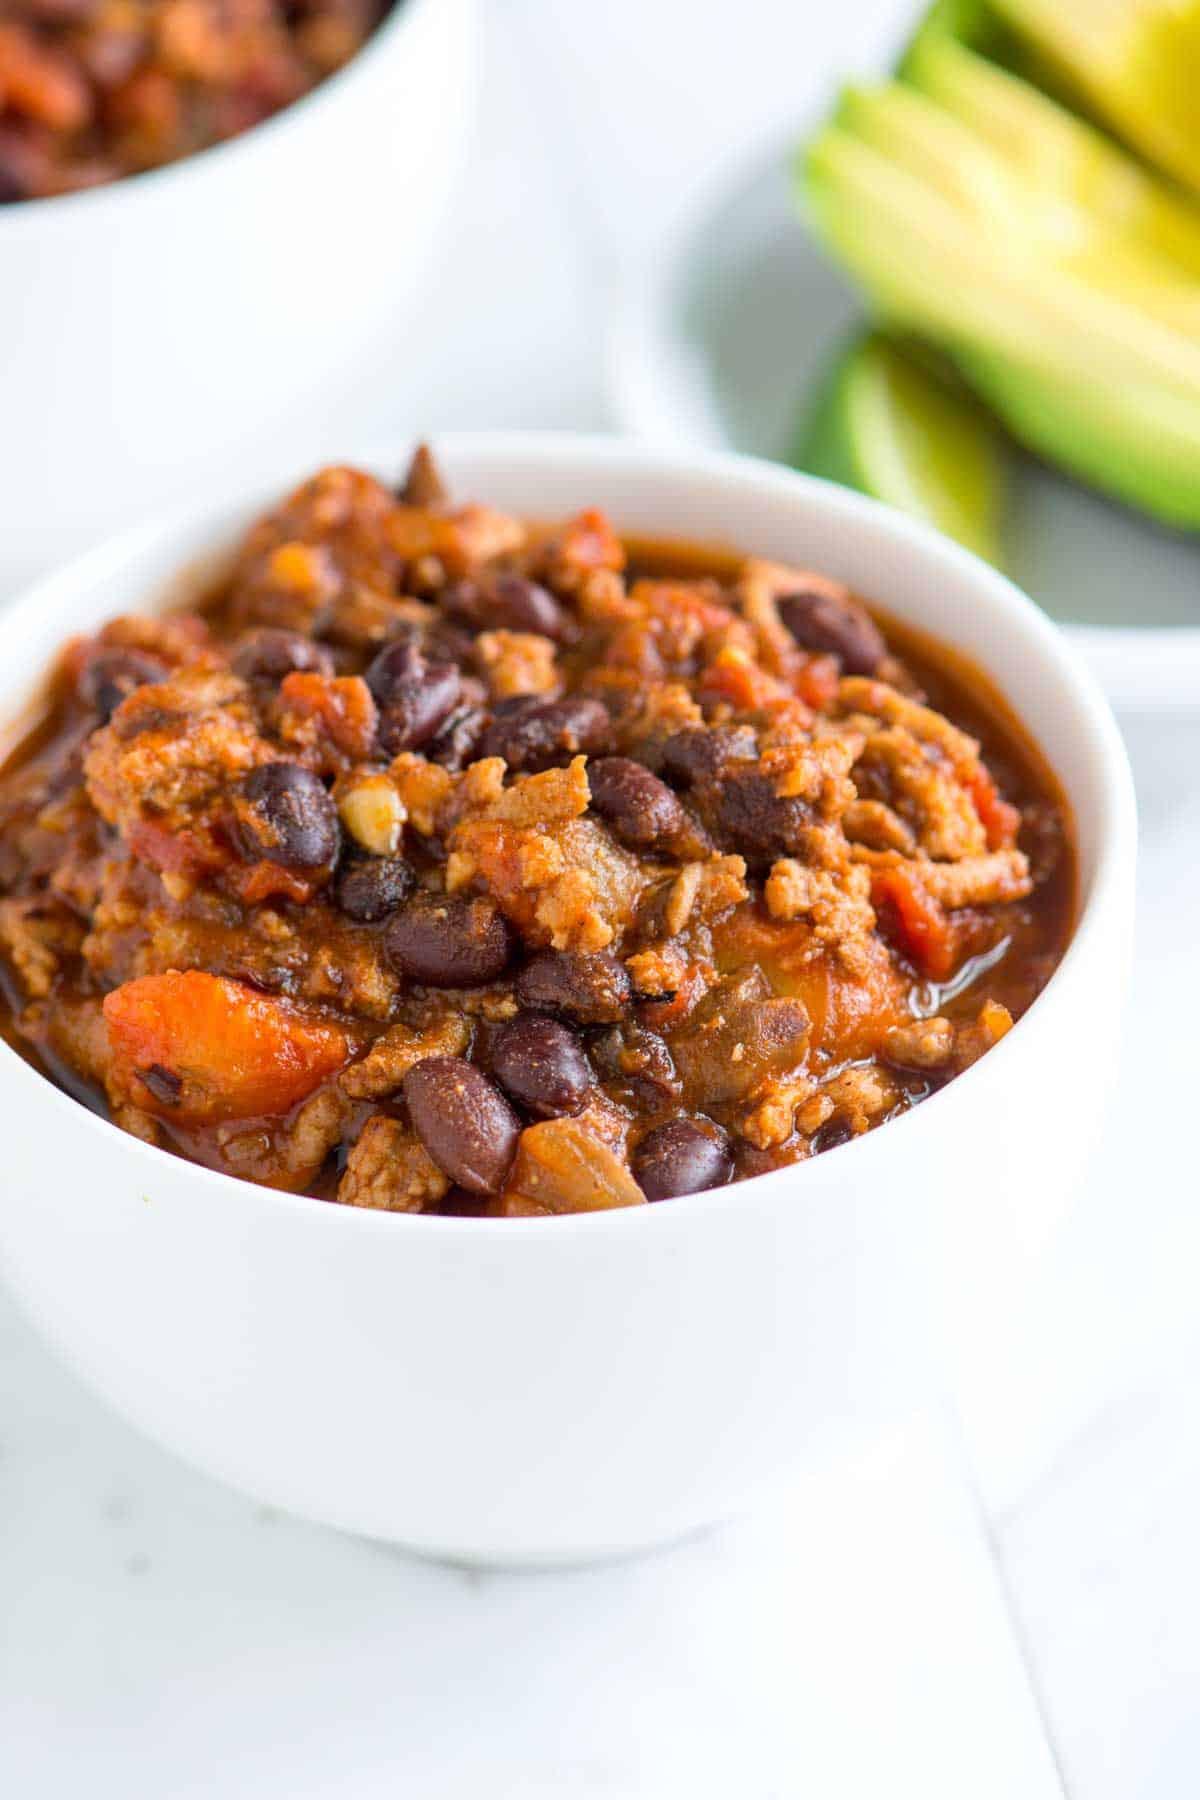 Healthy Turkey Chili  Irresistible Healthy Turkey Chili Recipe